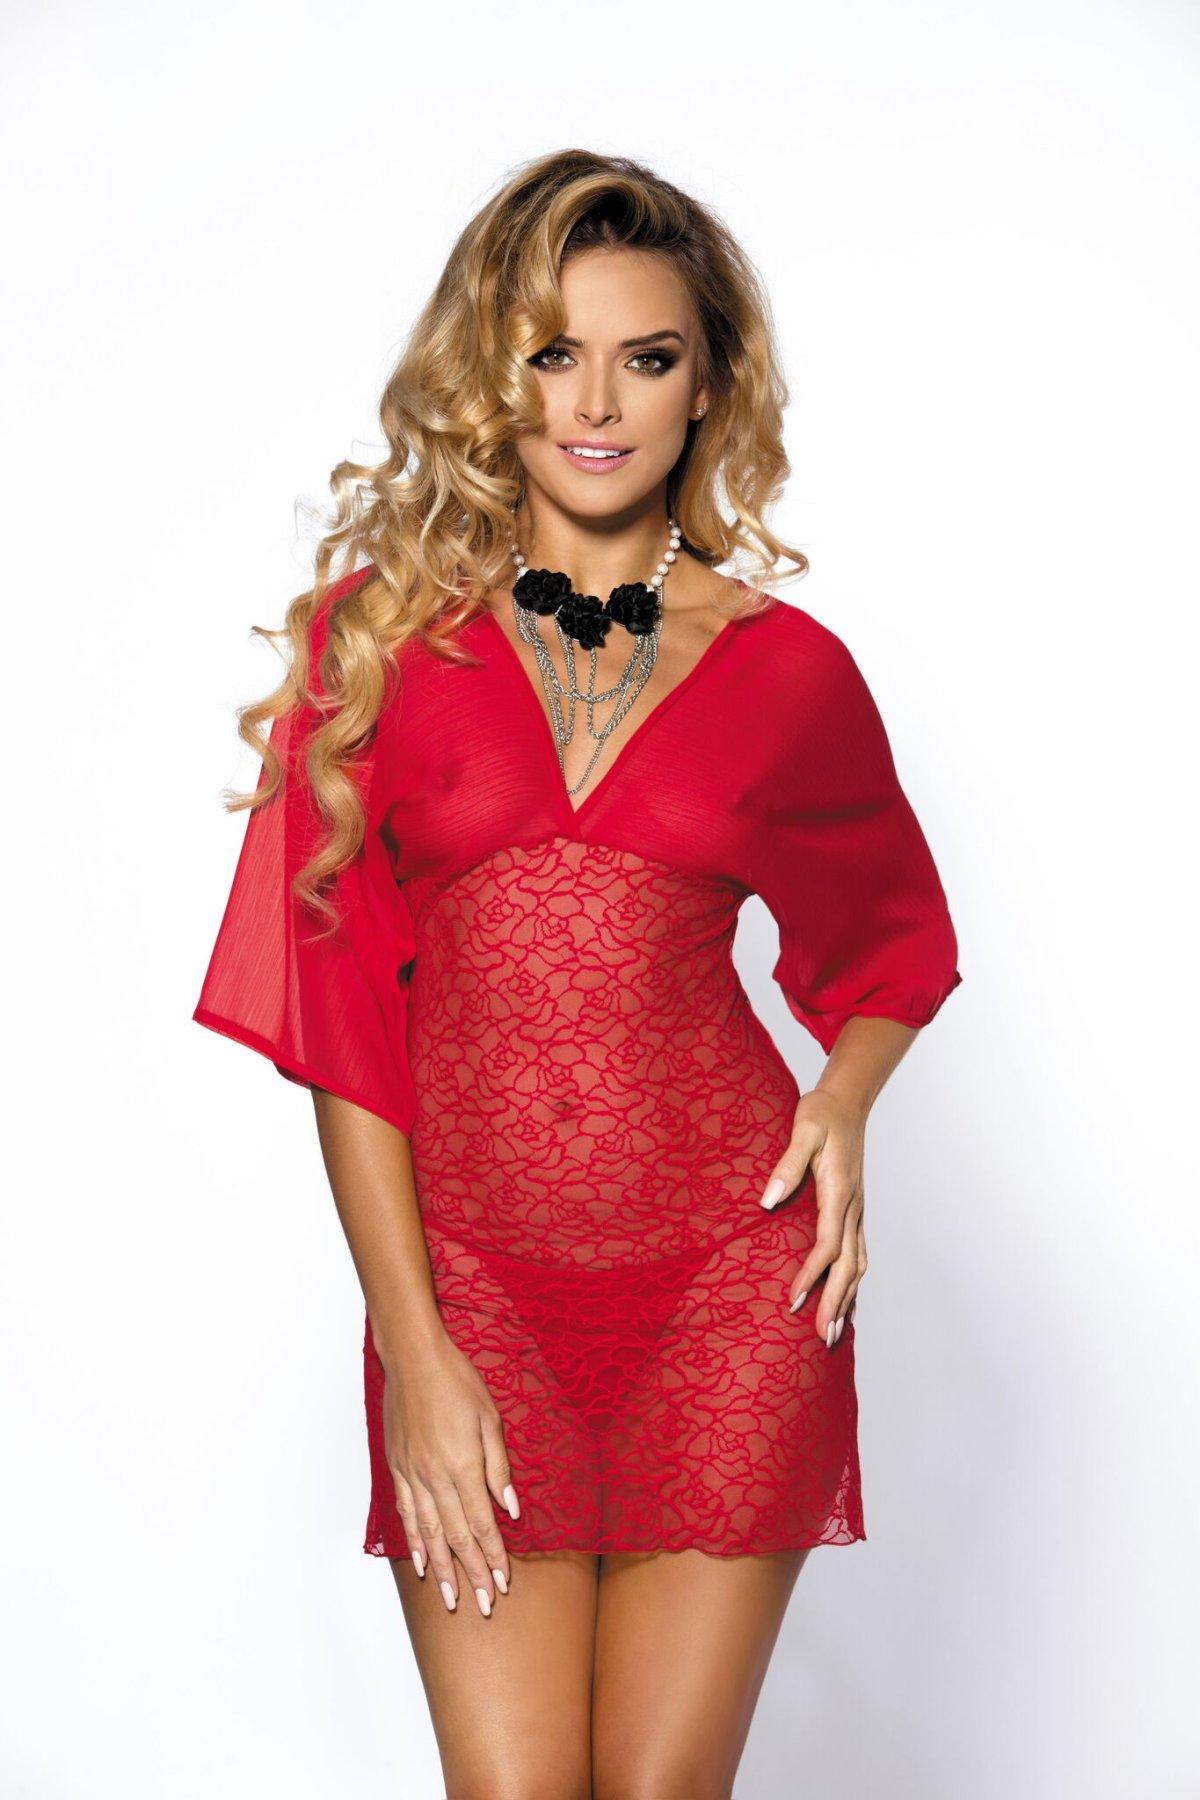 Lorna-RED